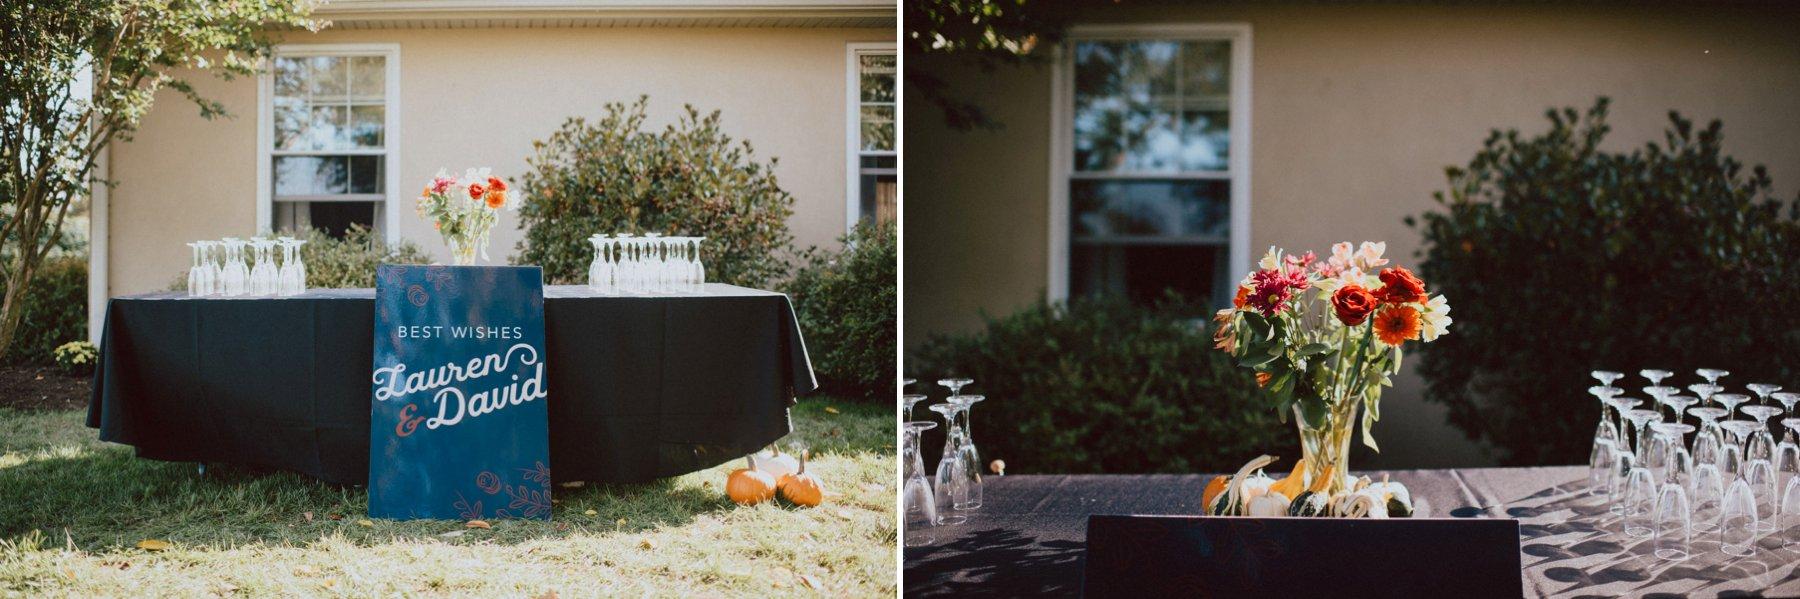 faunbrook-bed-and-breakfast-wedding-43.jpg